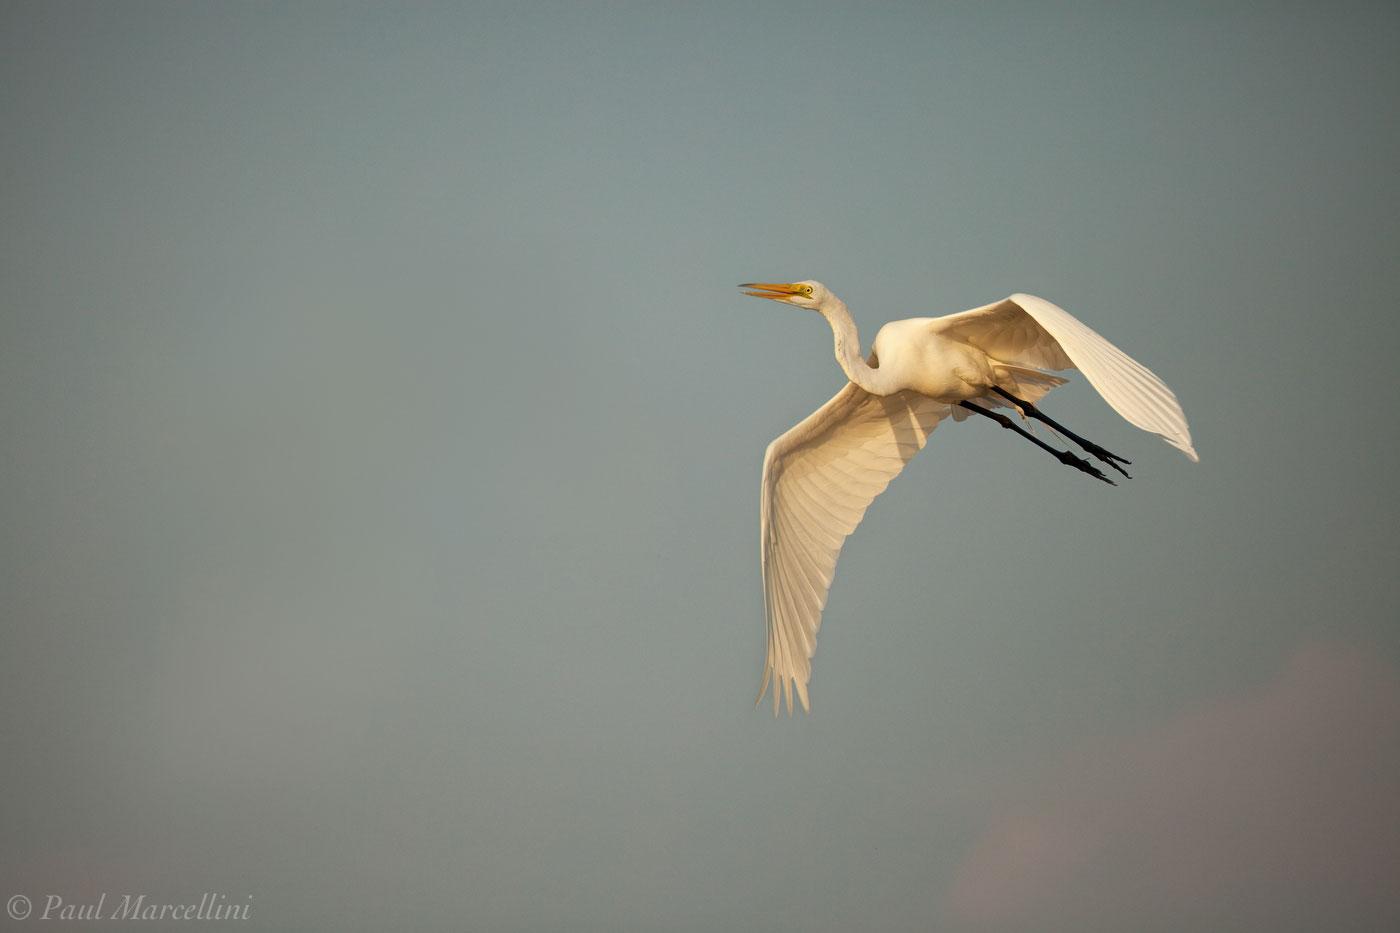 Ardea alba, great egret, ft. desoto, florida, ft desoto, fort desoto, desoto, photo